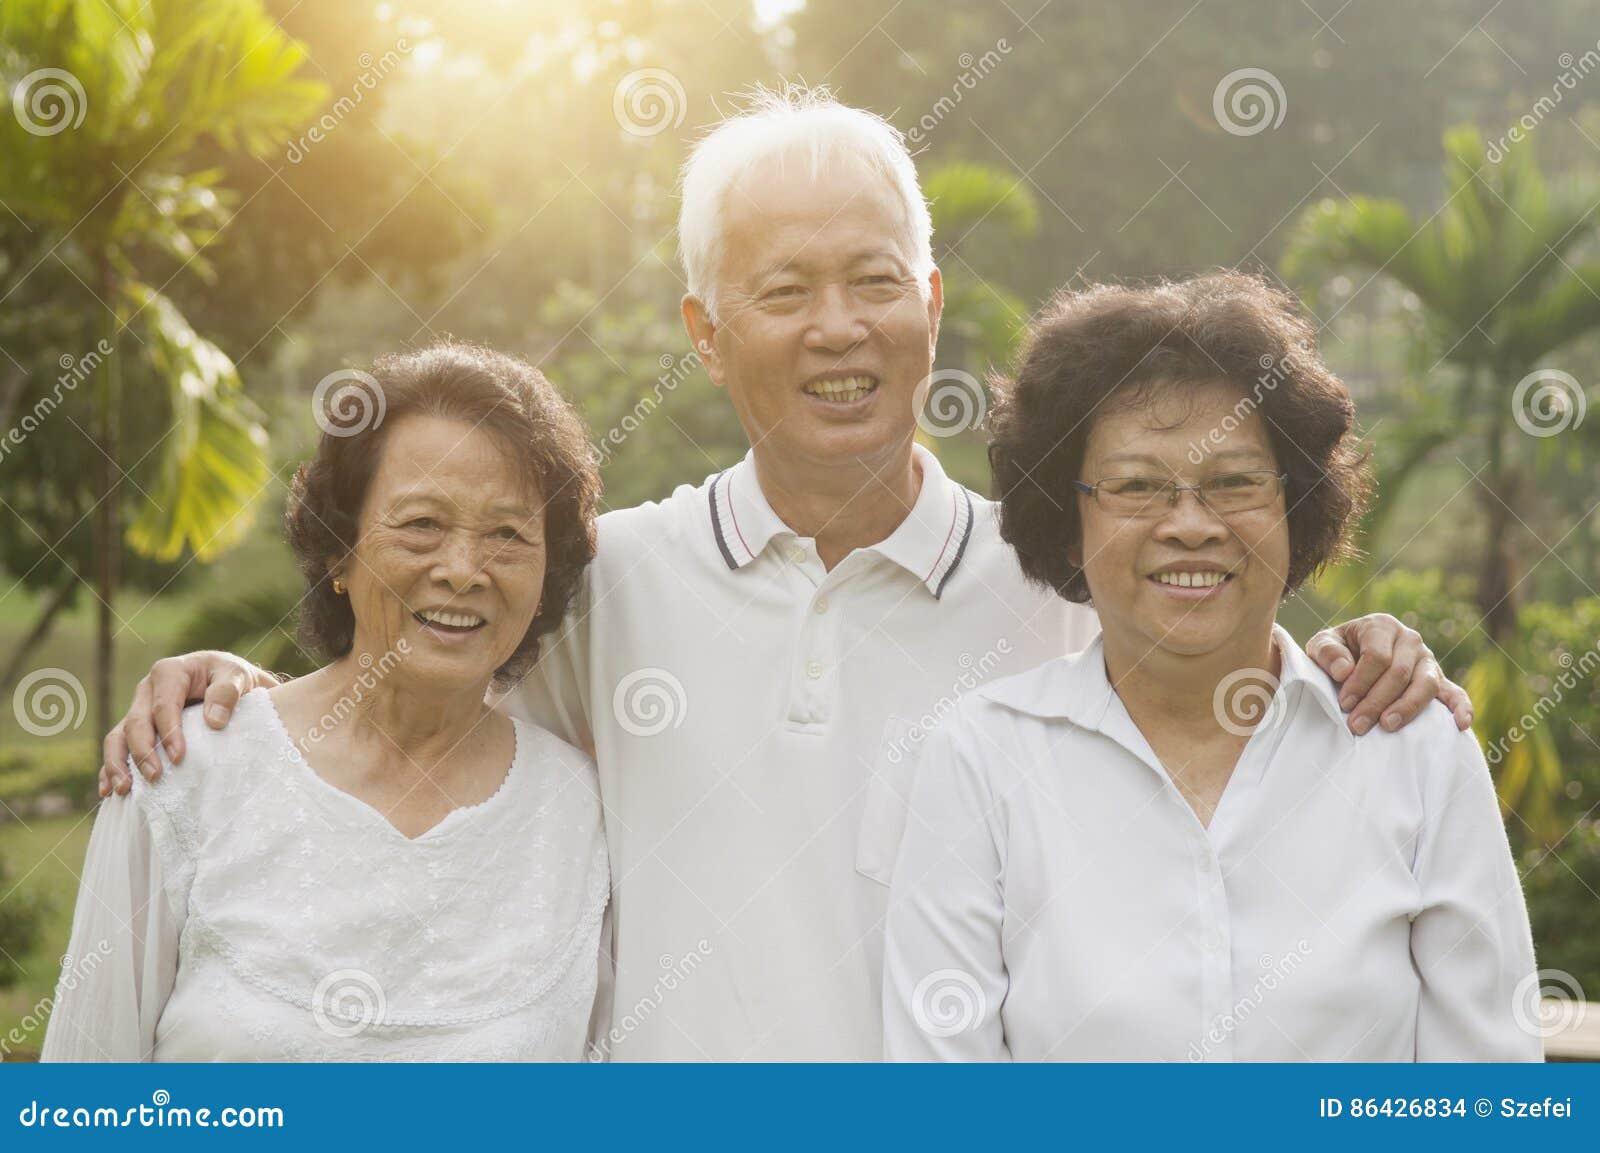 Asian seniors group at outdoor park